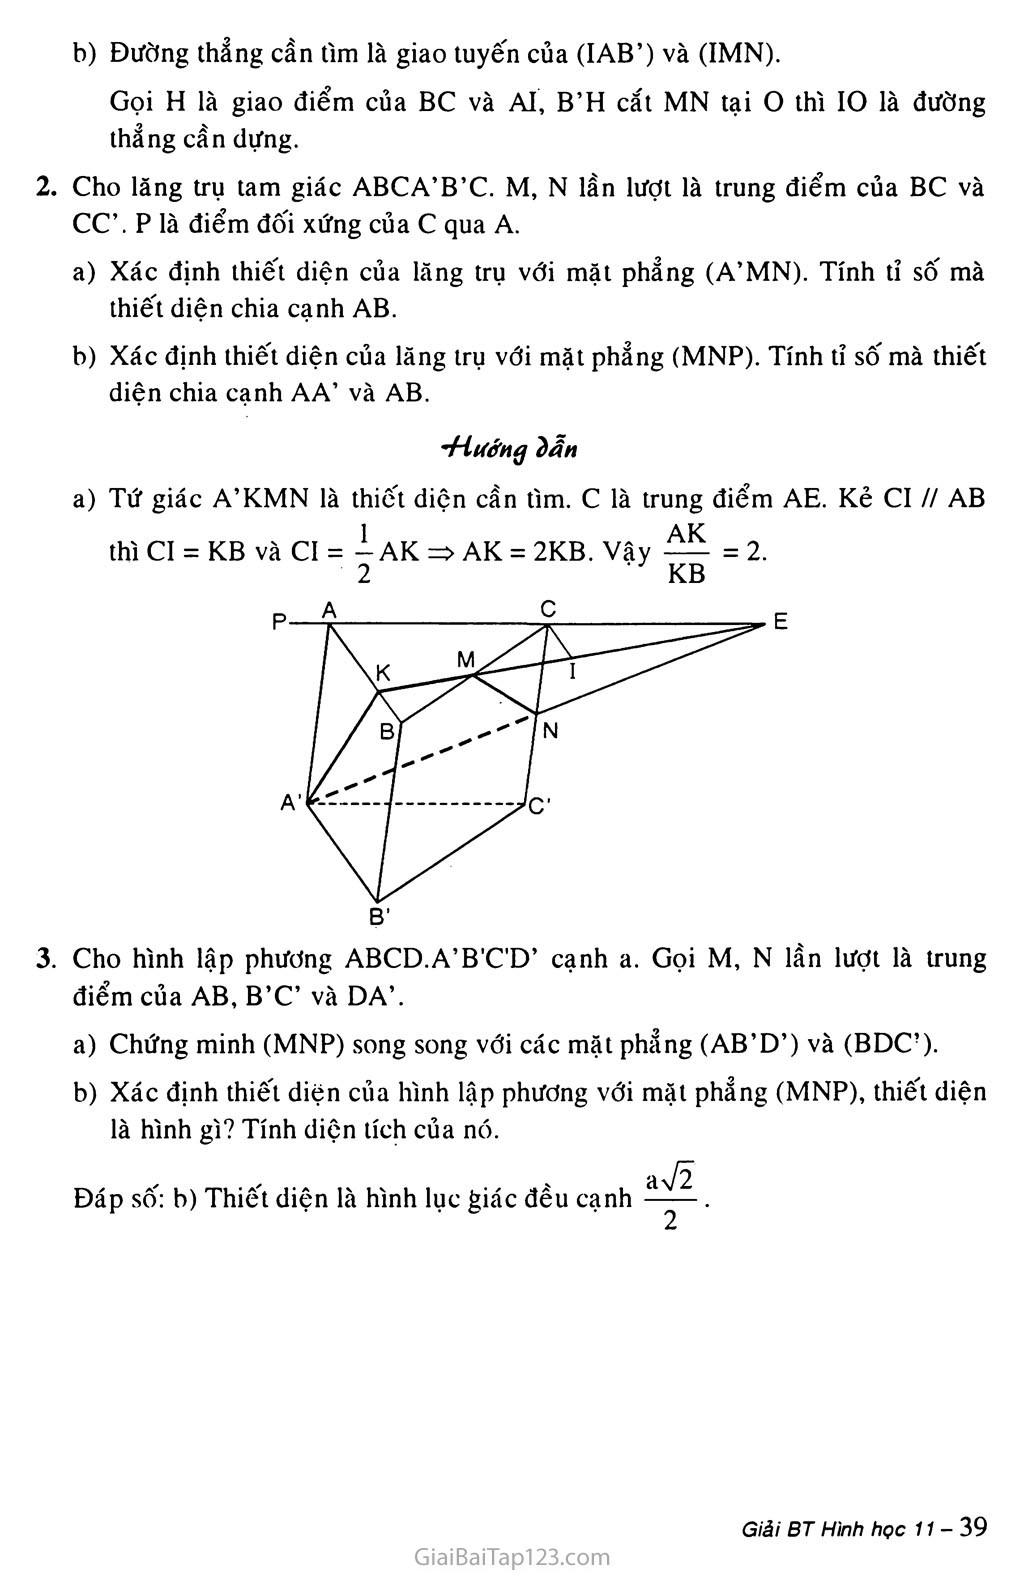 Bài 4. Hai mặt phẳng song song trang 6